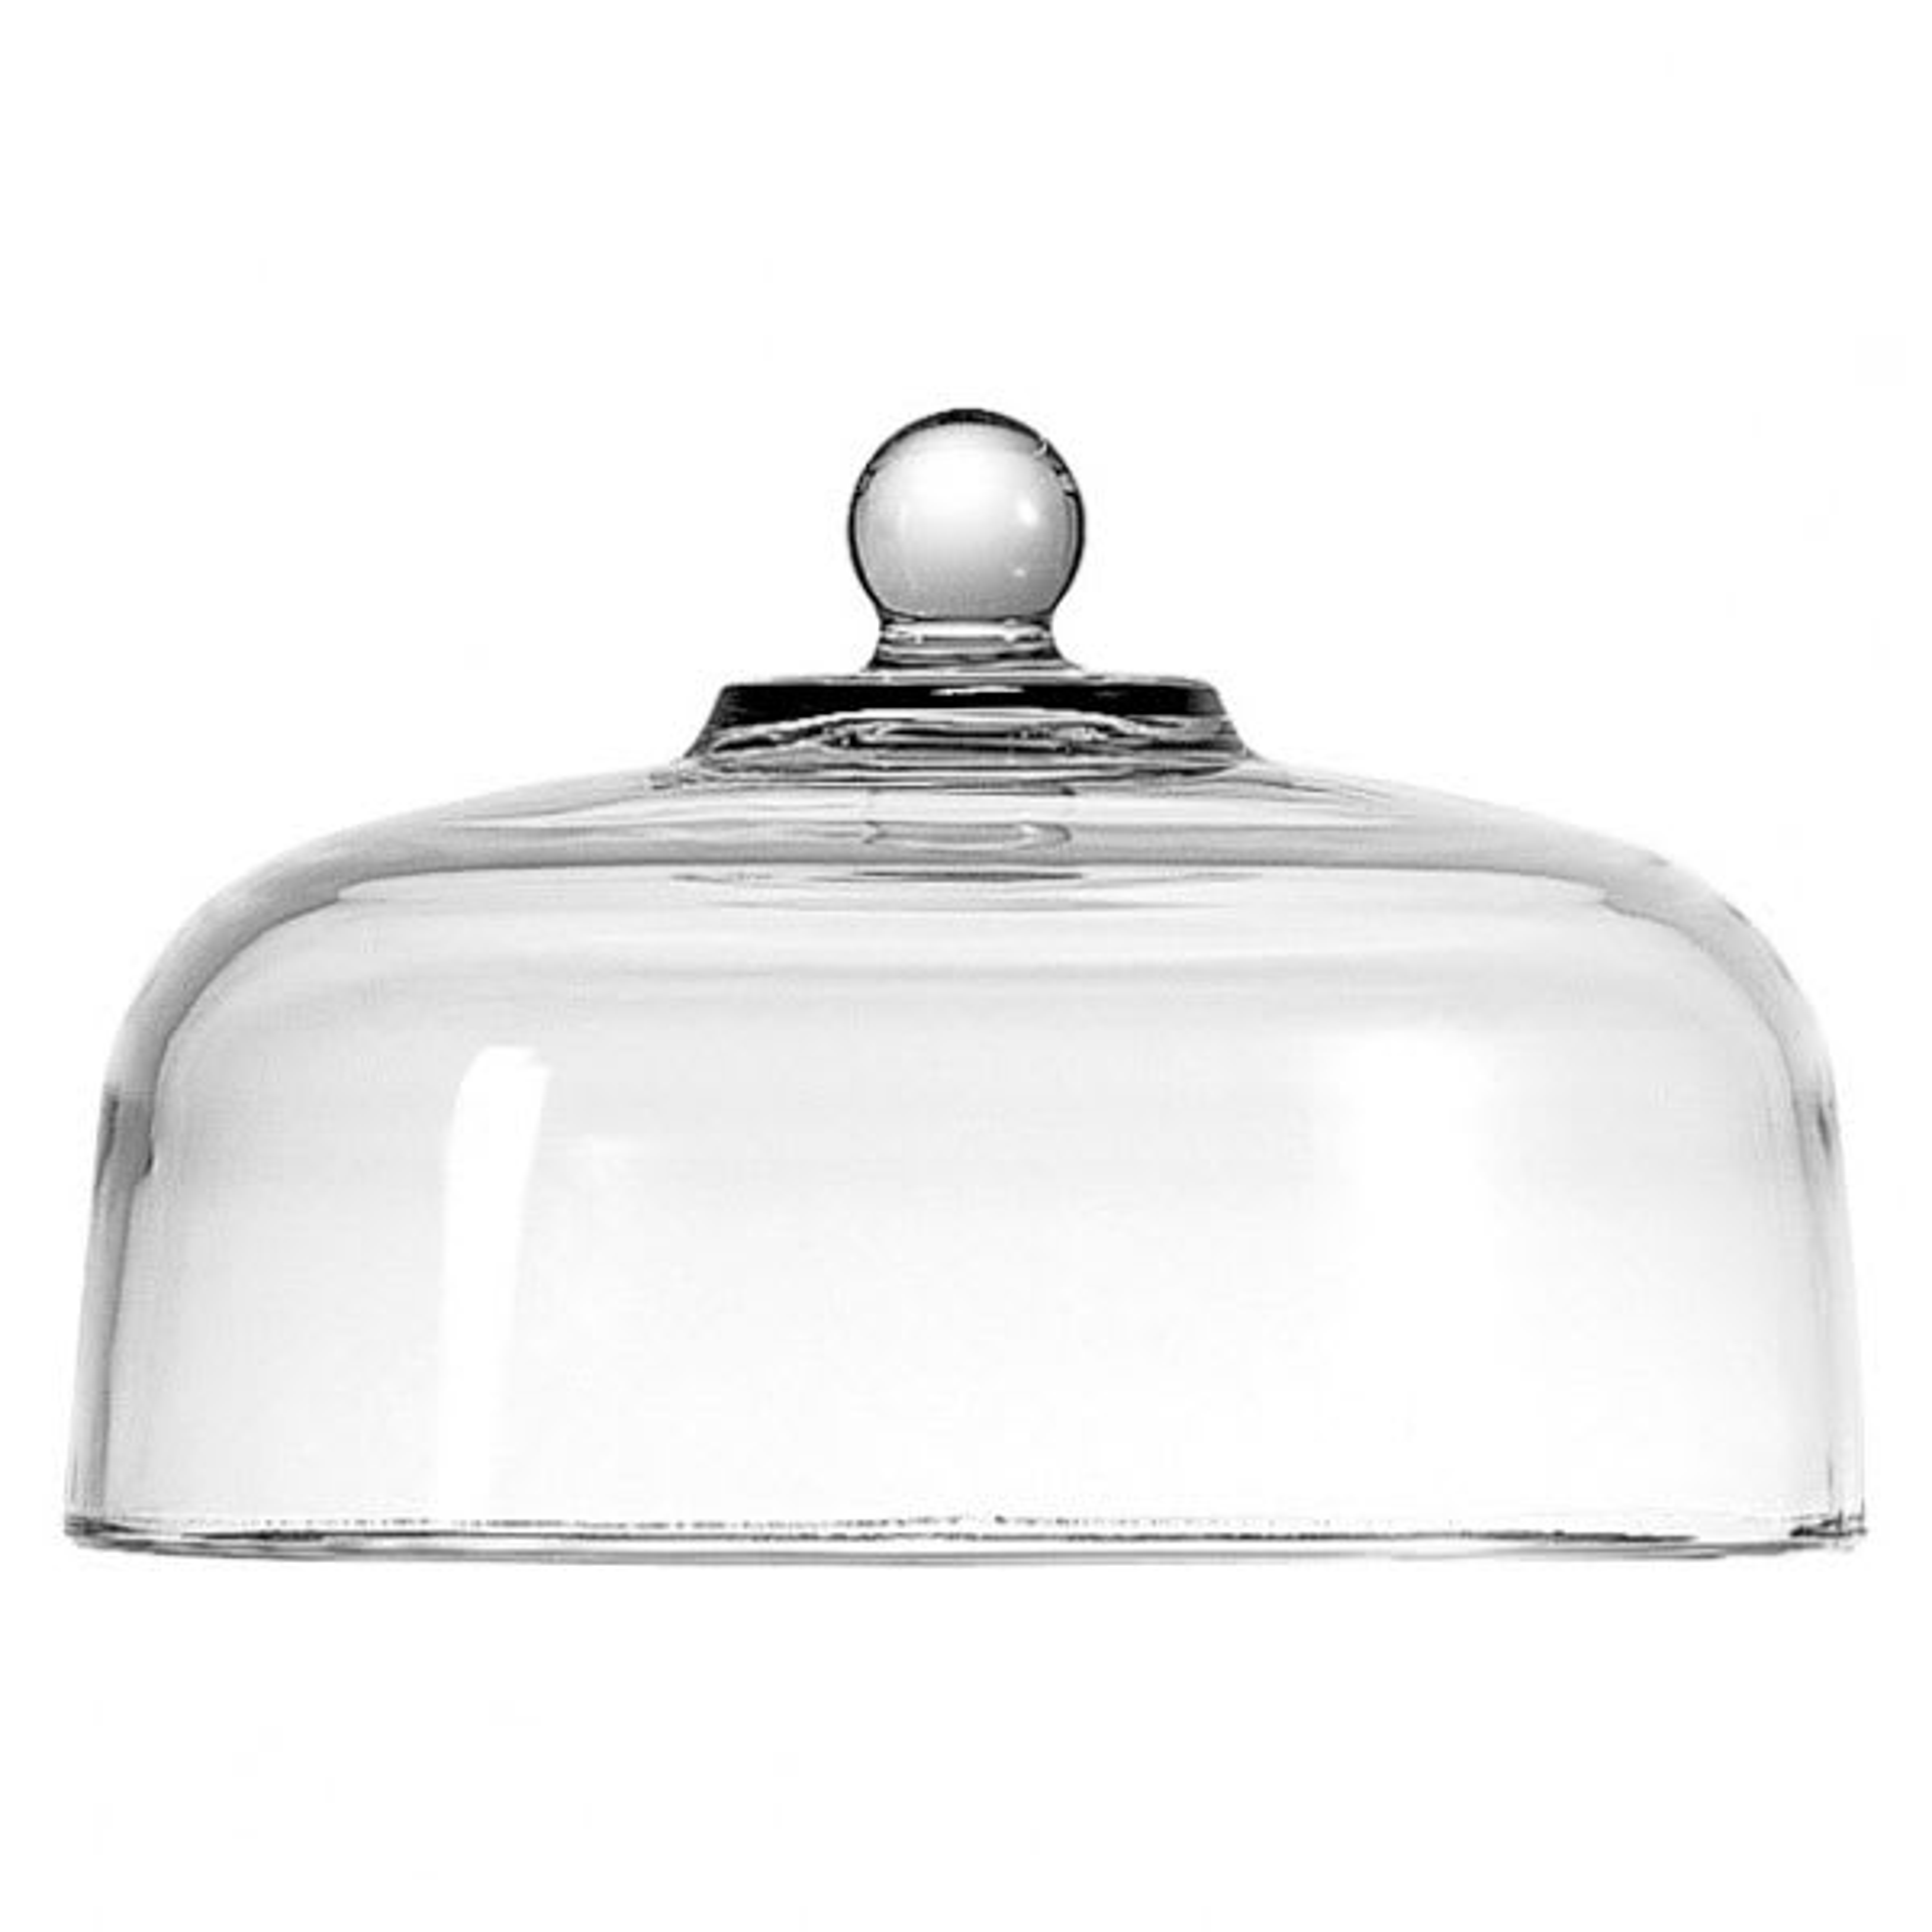 "Anchor 340Q 11.25"" Sure Guard Glass Cake Dome"